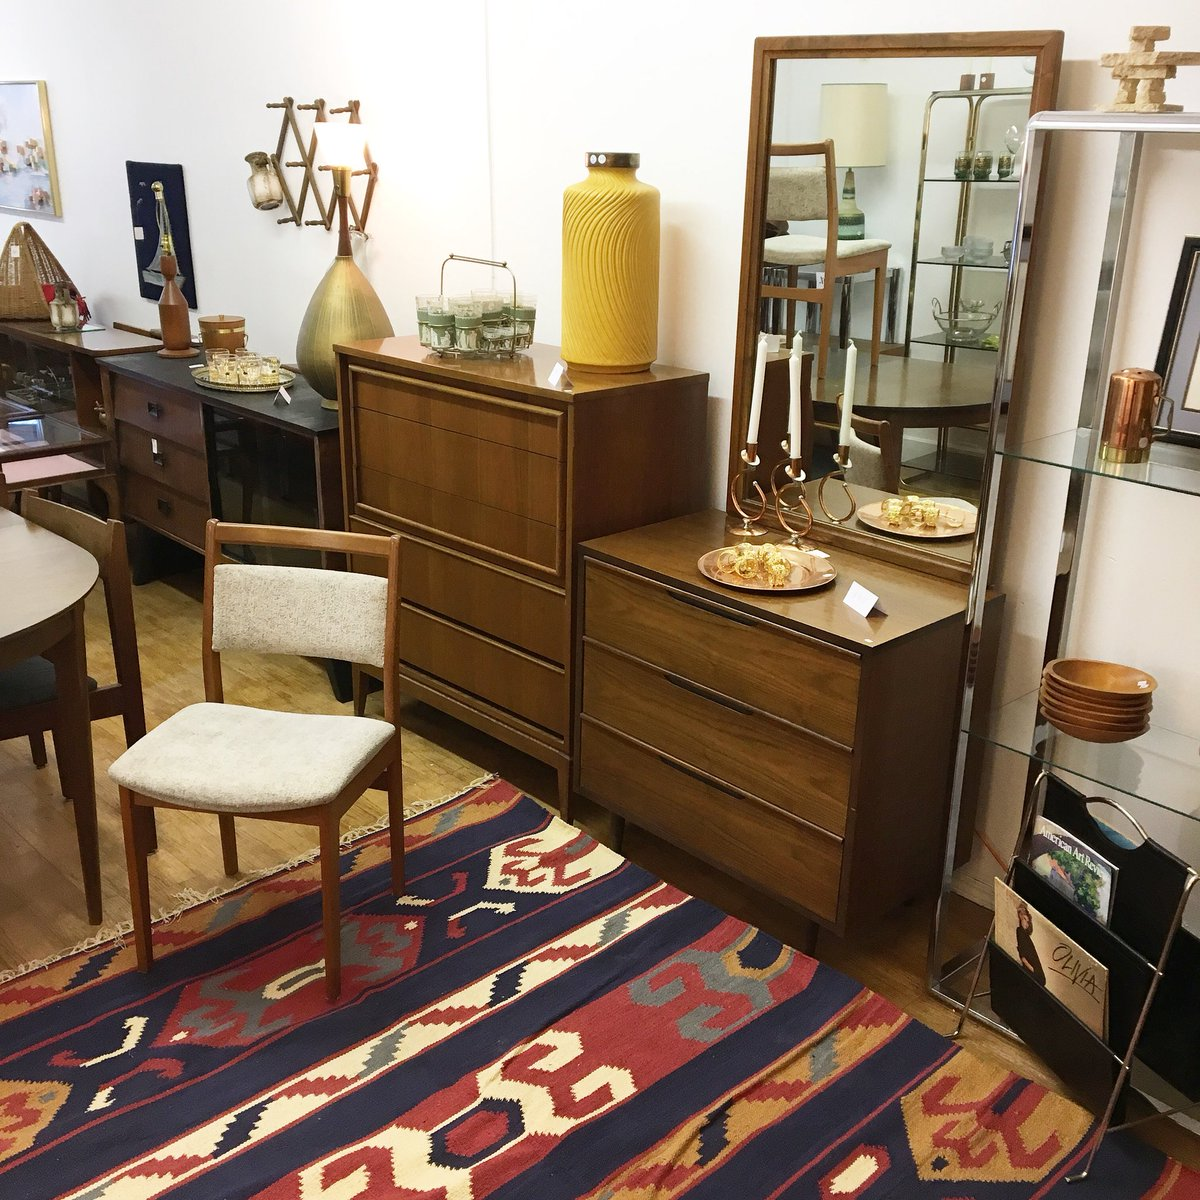 extraordinary vintage home decor winnipeg photos simple On home decor winnipeg